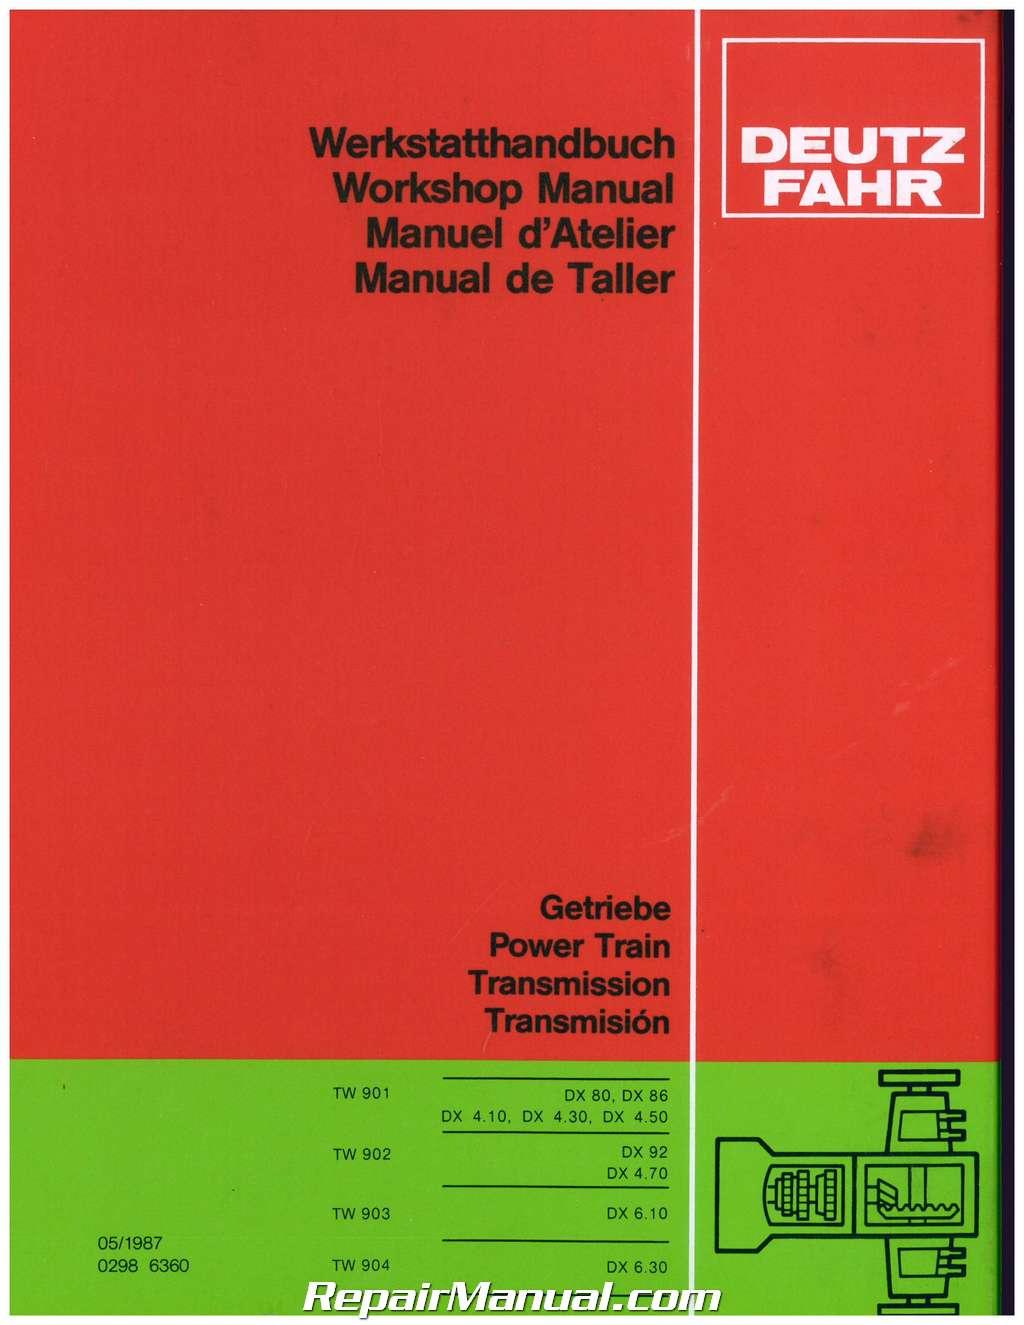 deutz allis model dx120 transmission service manual rh repairmanual com Deutz Diesel Parts List Deutz Repair Manual